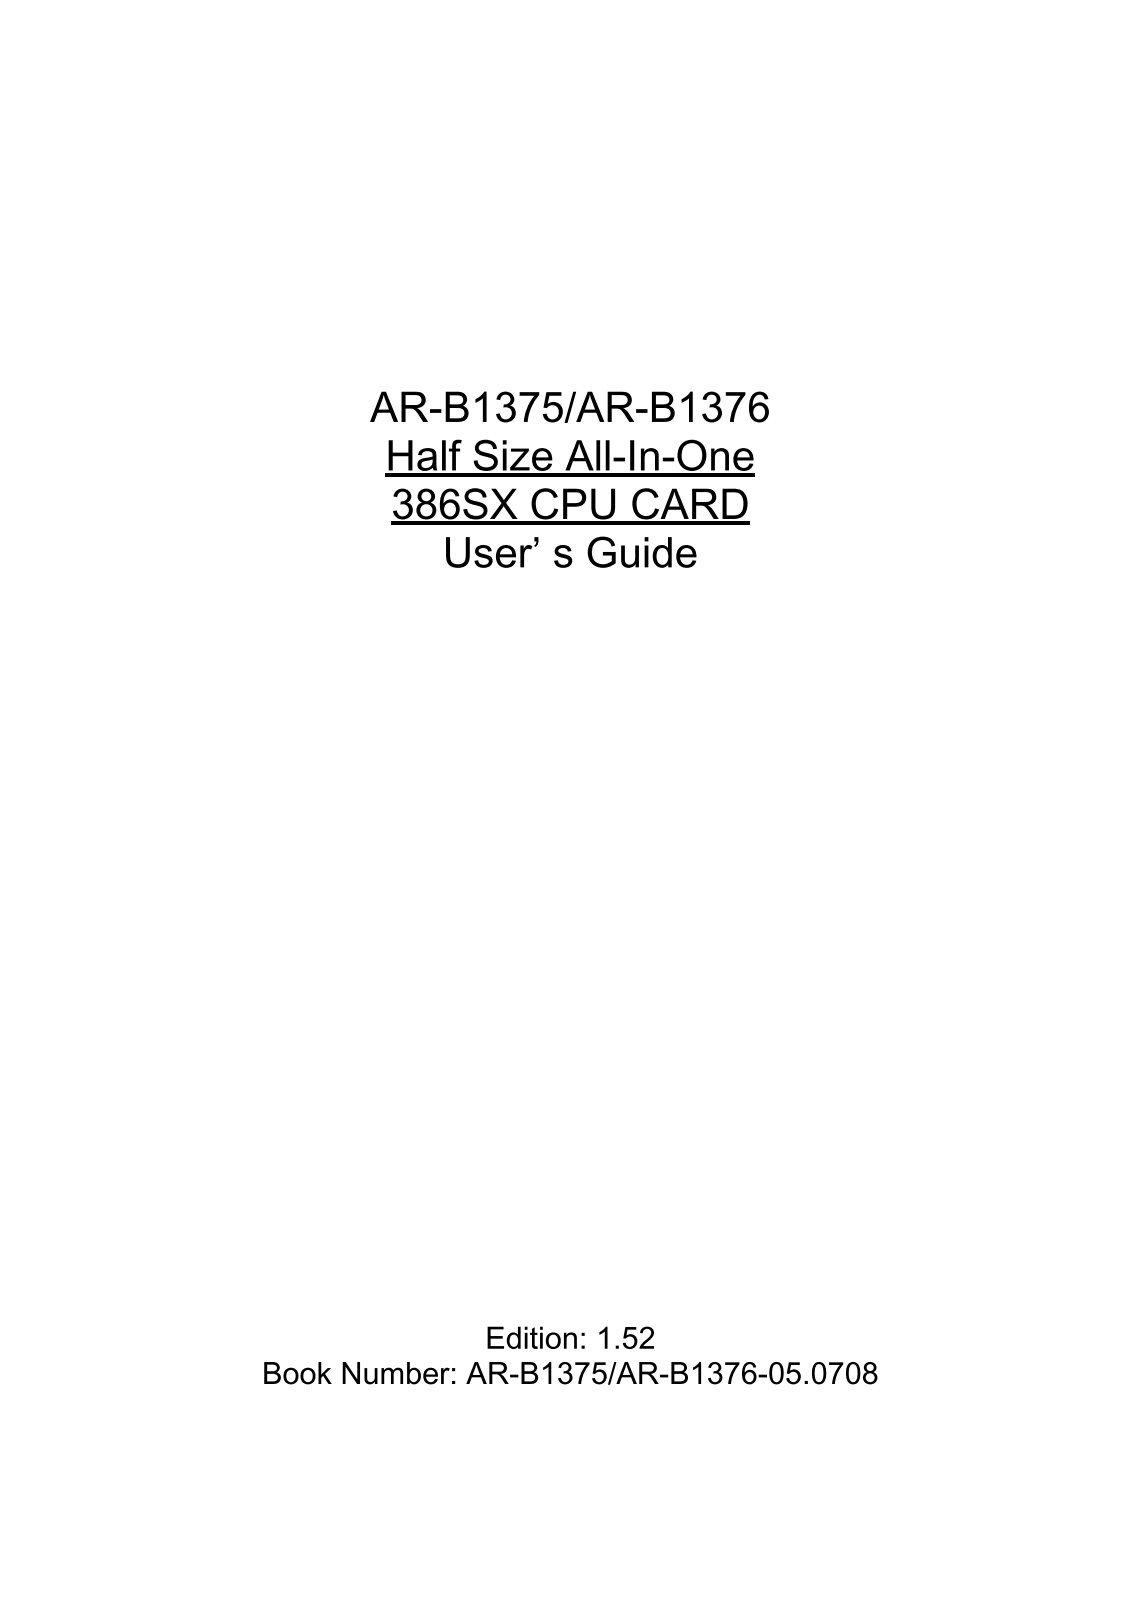 ACROSSER AR-B1376 DRIVERS FOR WINDOWS 8